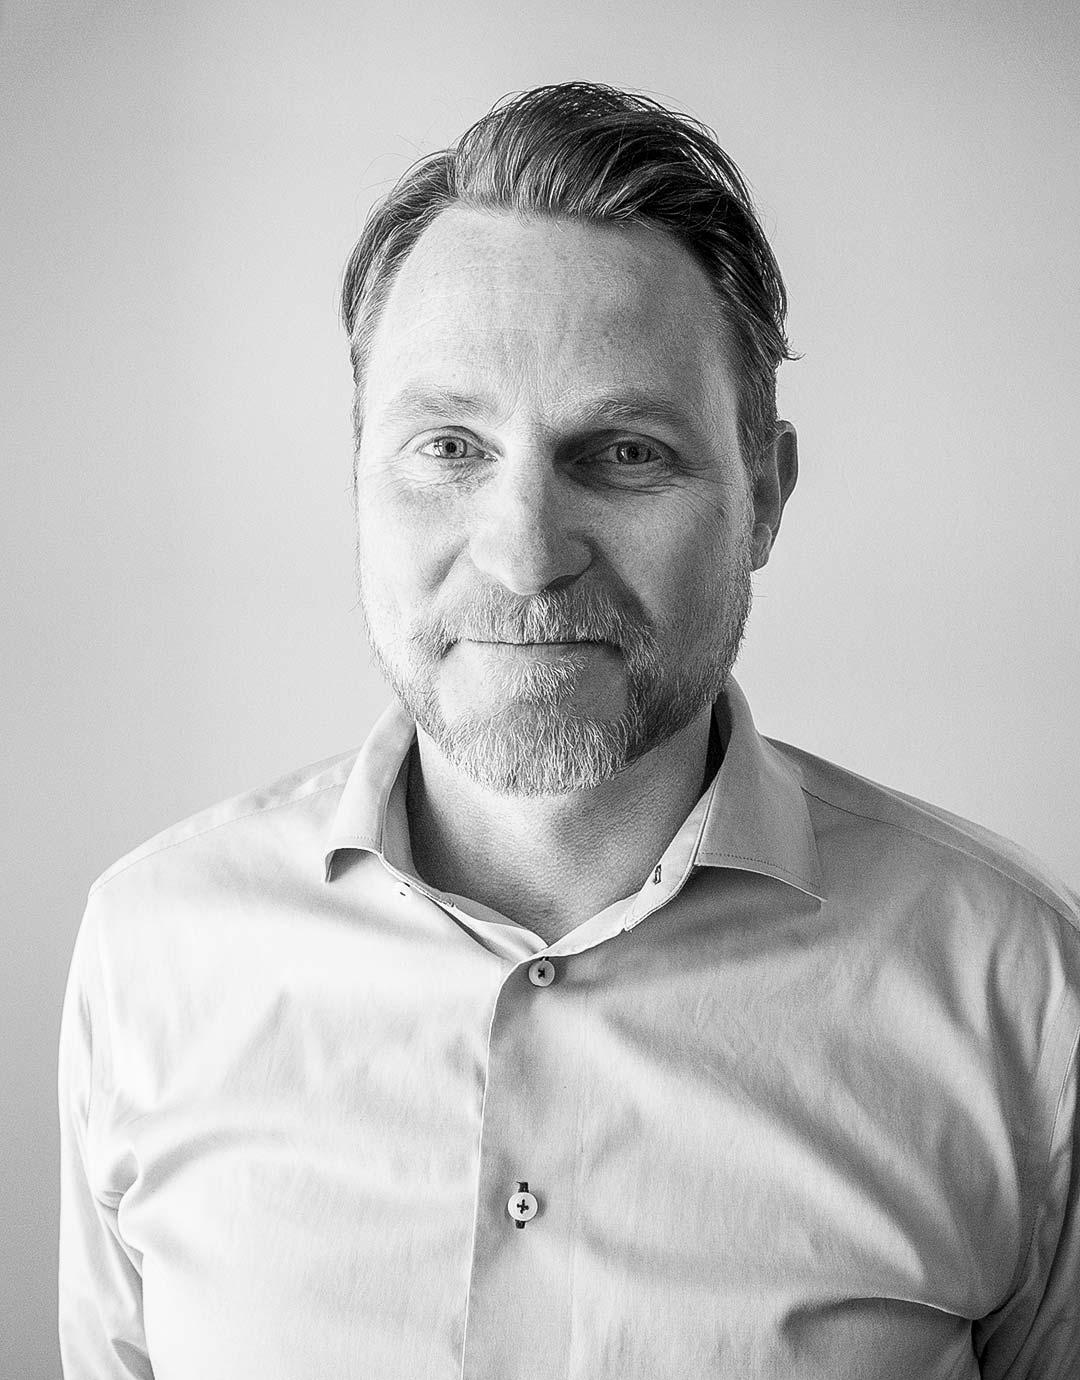 Fredrik Sjöqvist